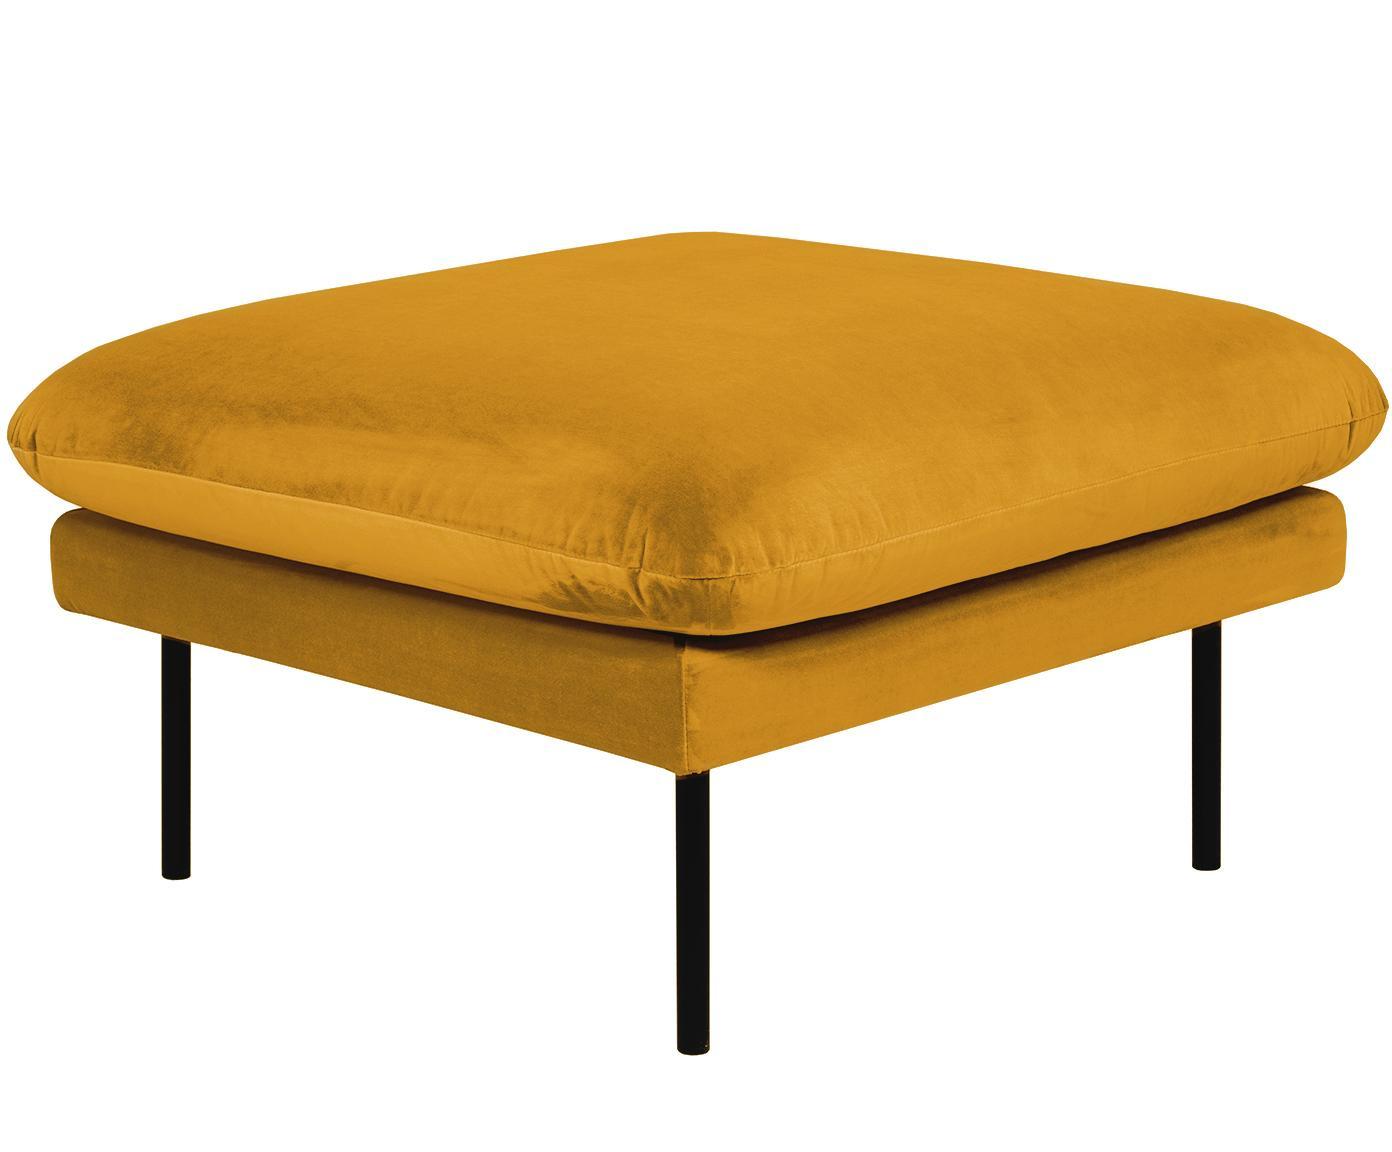 Sofa-Hocker Moby aus Samt, Bezug: Samt (Hochwertiger Polyes, Gestell: Massives Kiefernholz, Samt Senfgelb, 78 x 48 cm